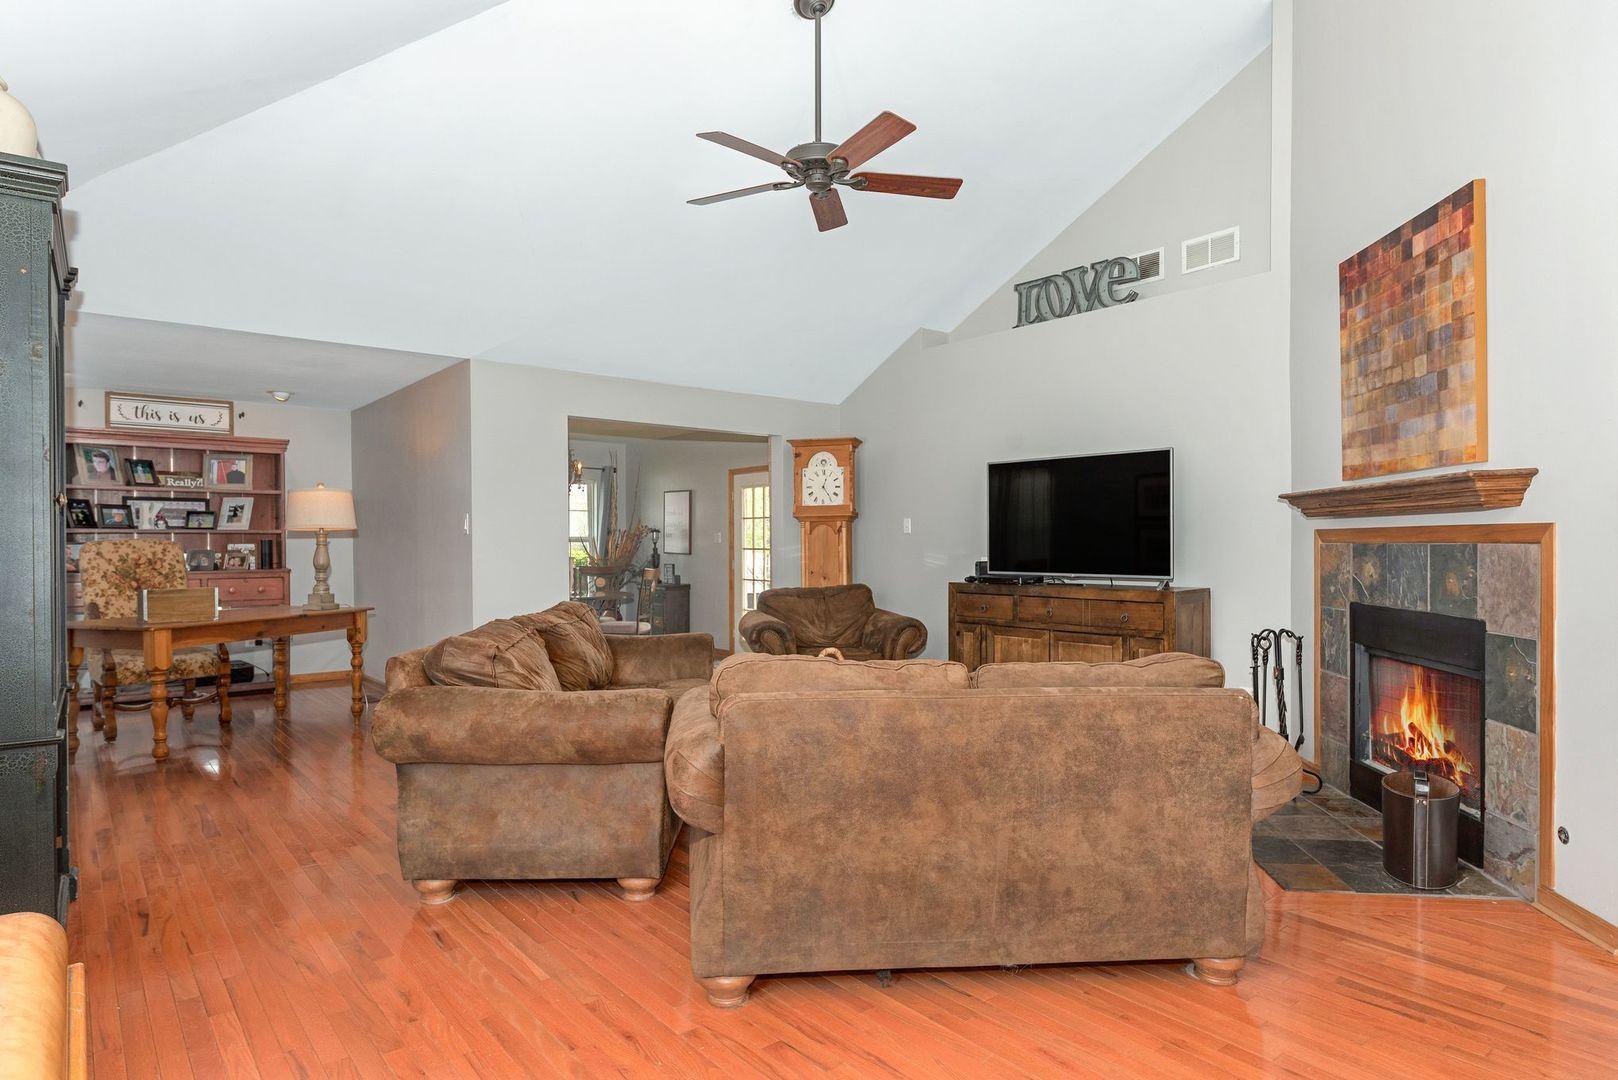 Photo of 24521 States Lane, Shorewood, IL 60404 (MLS # 11063427)